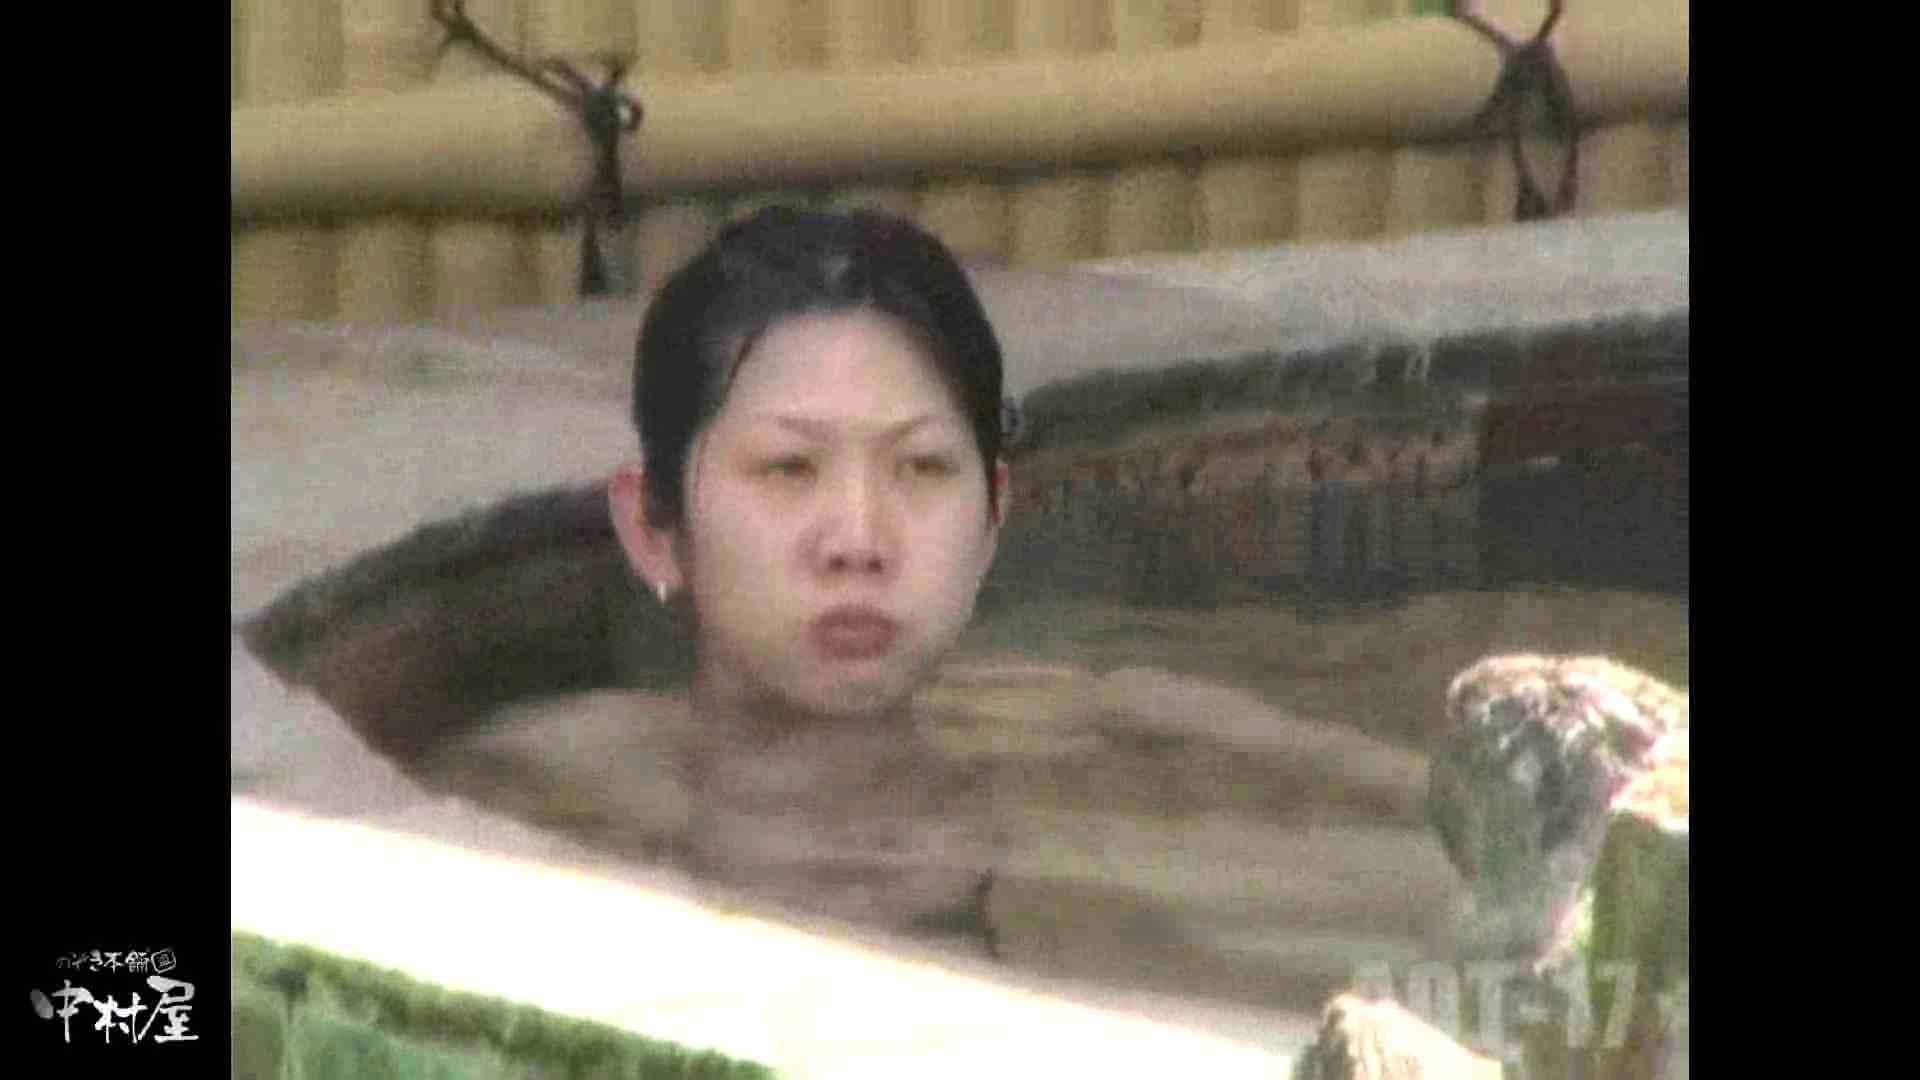 Aquaな露天風呂Vol.881潜入盗撮露天風呂十七判湯 其の三 潜入 のぞき動画画像 72画像 67